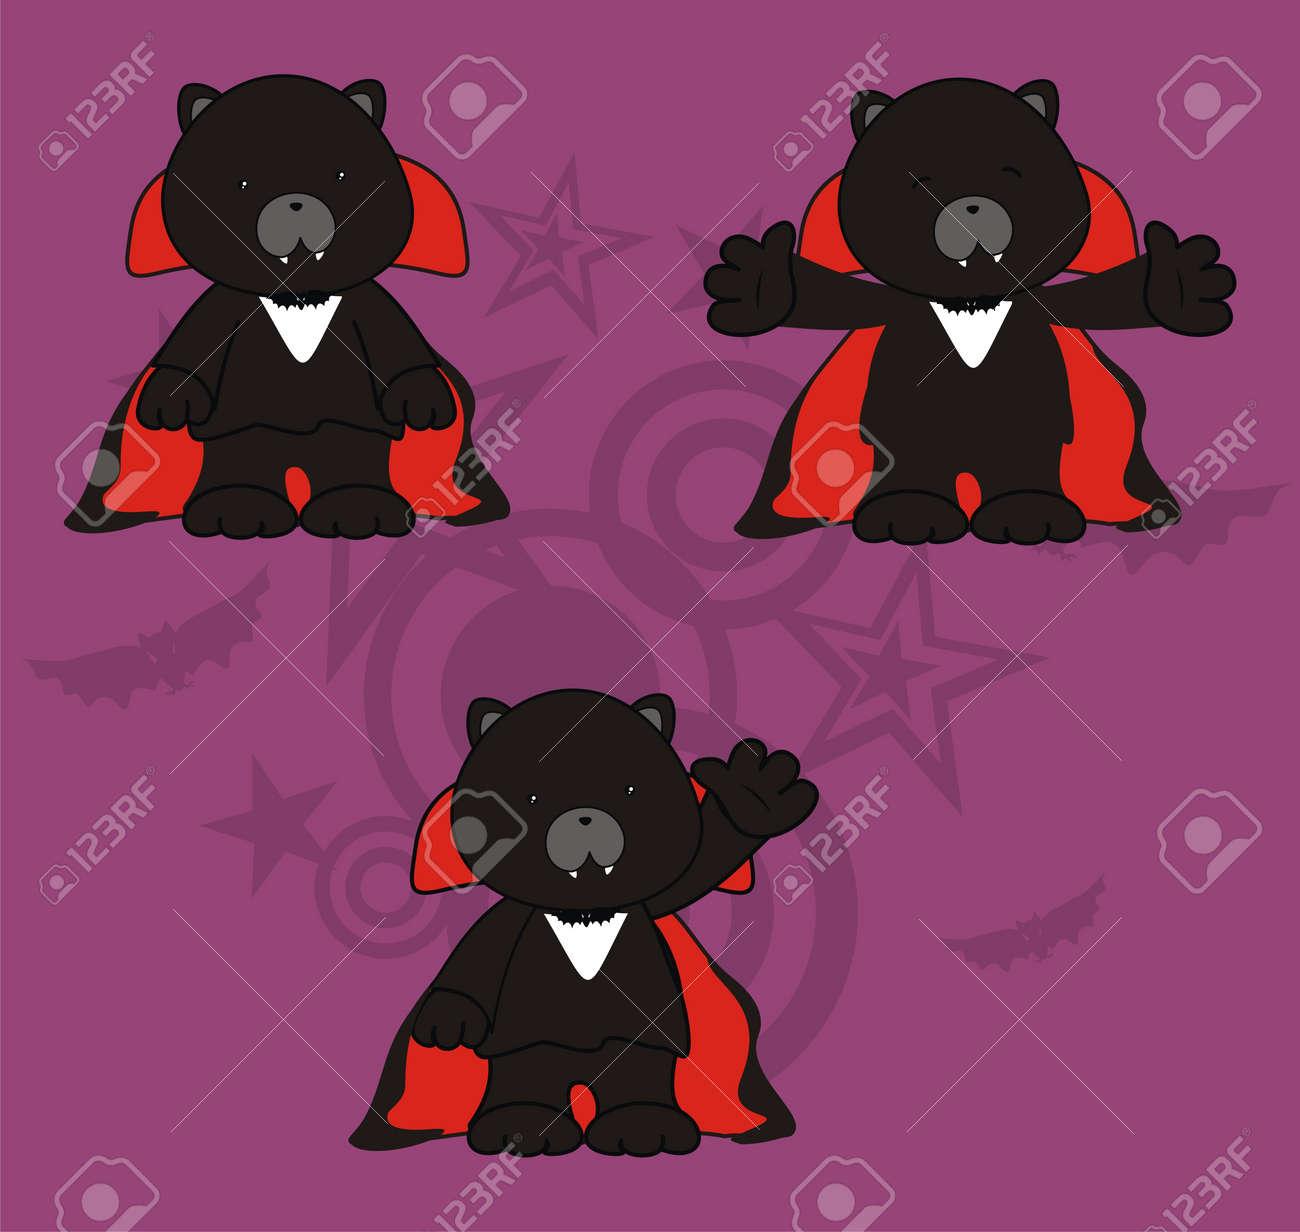 panther dracula cartoon set in vector format Stock Vector - 10485390